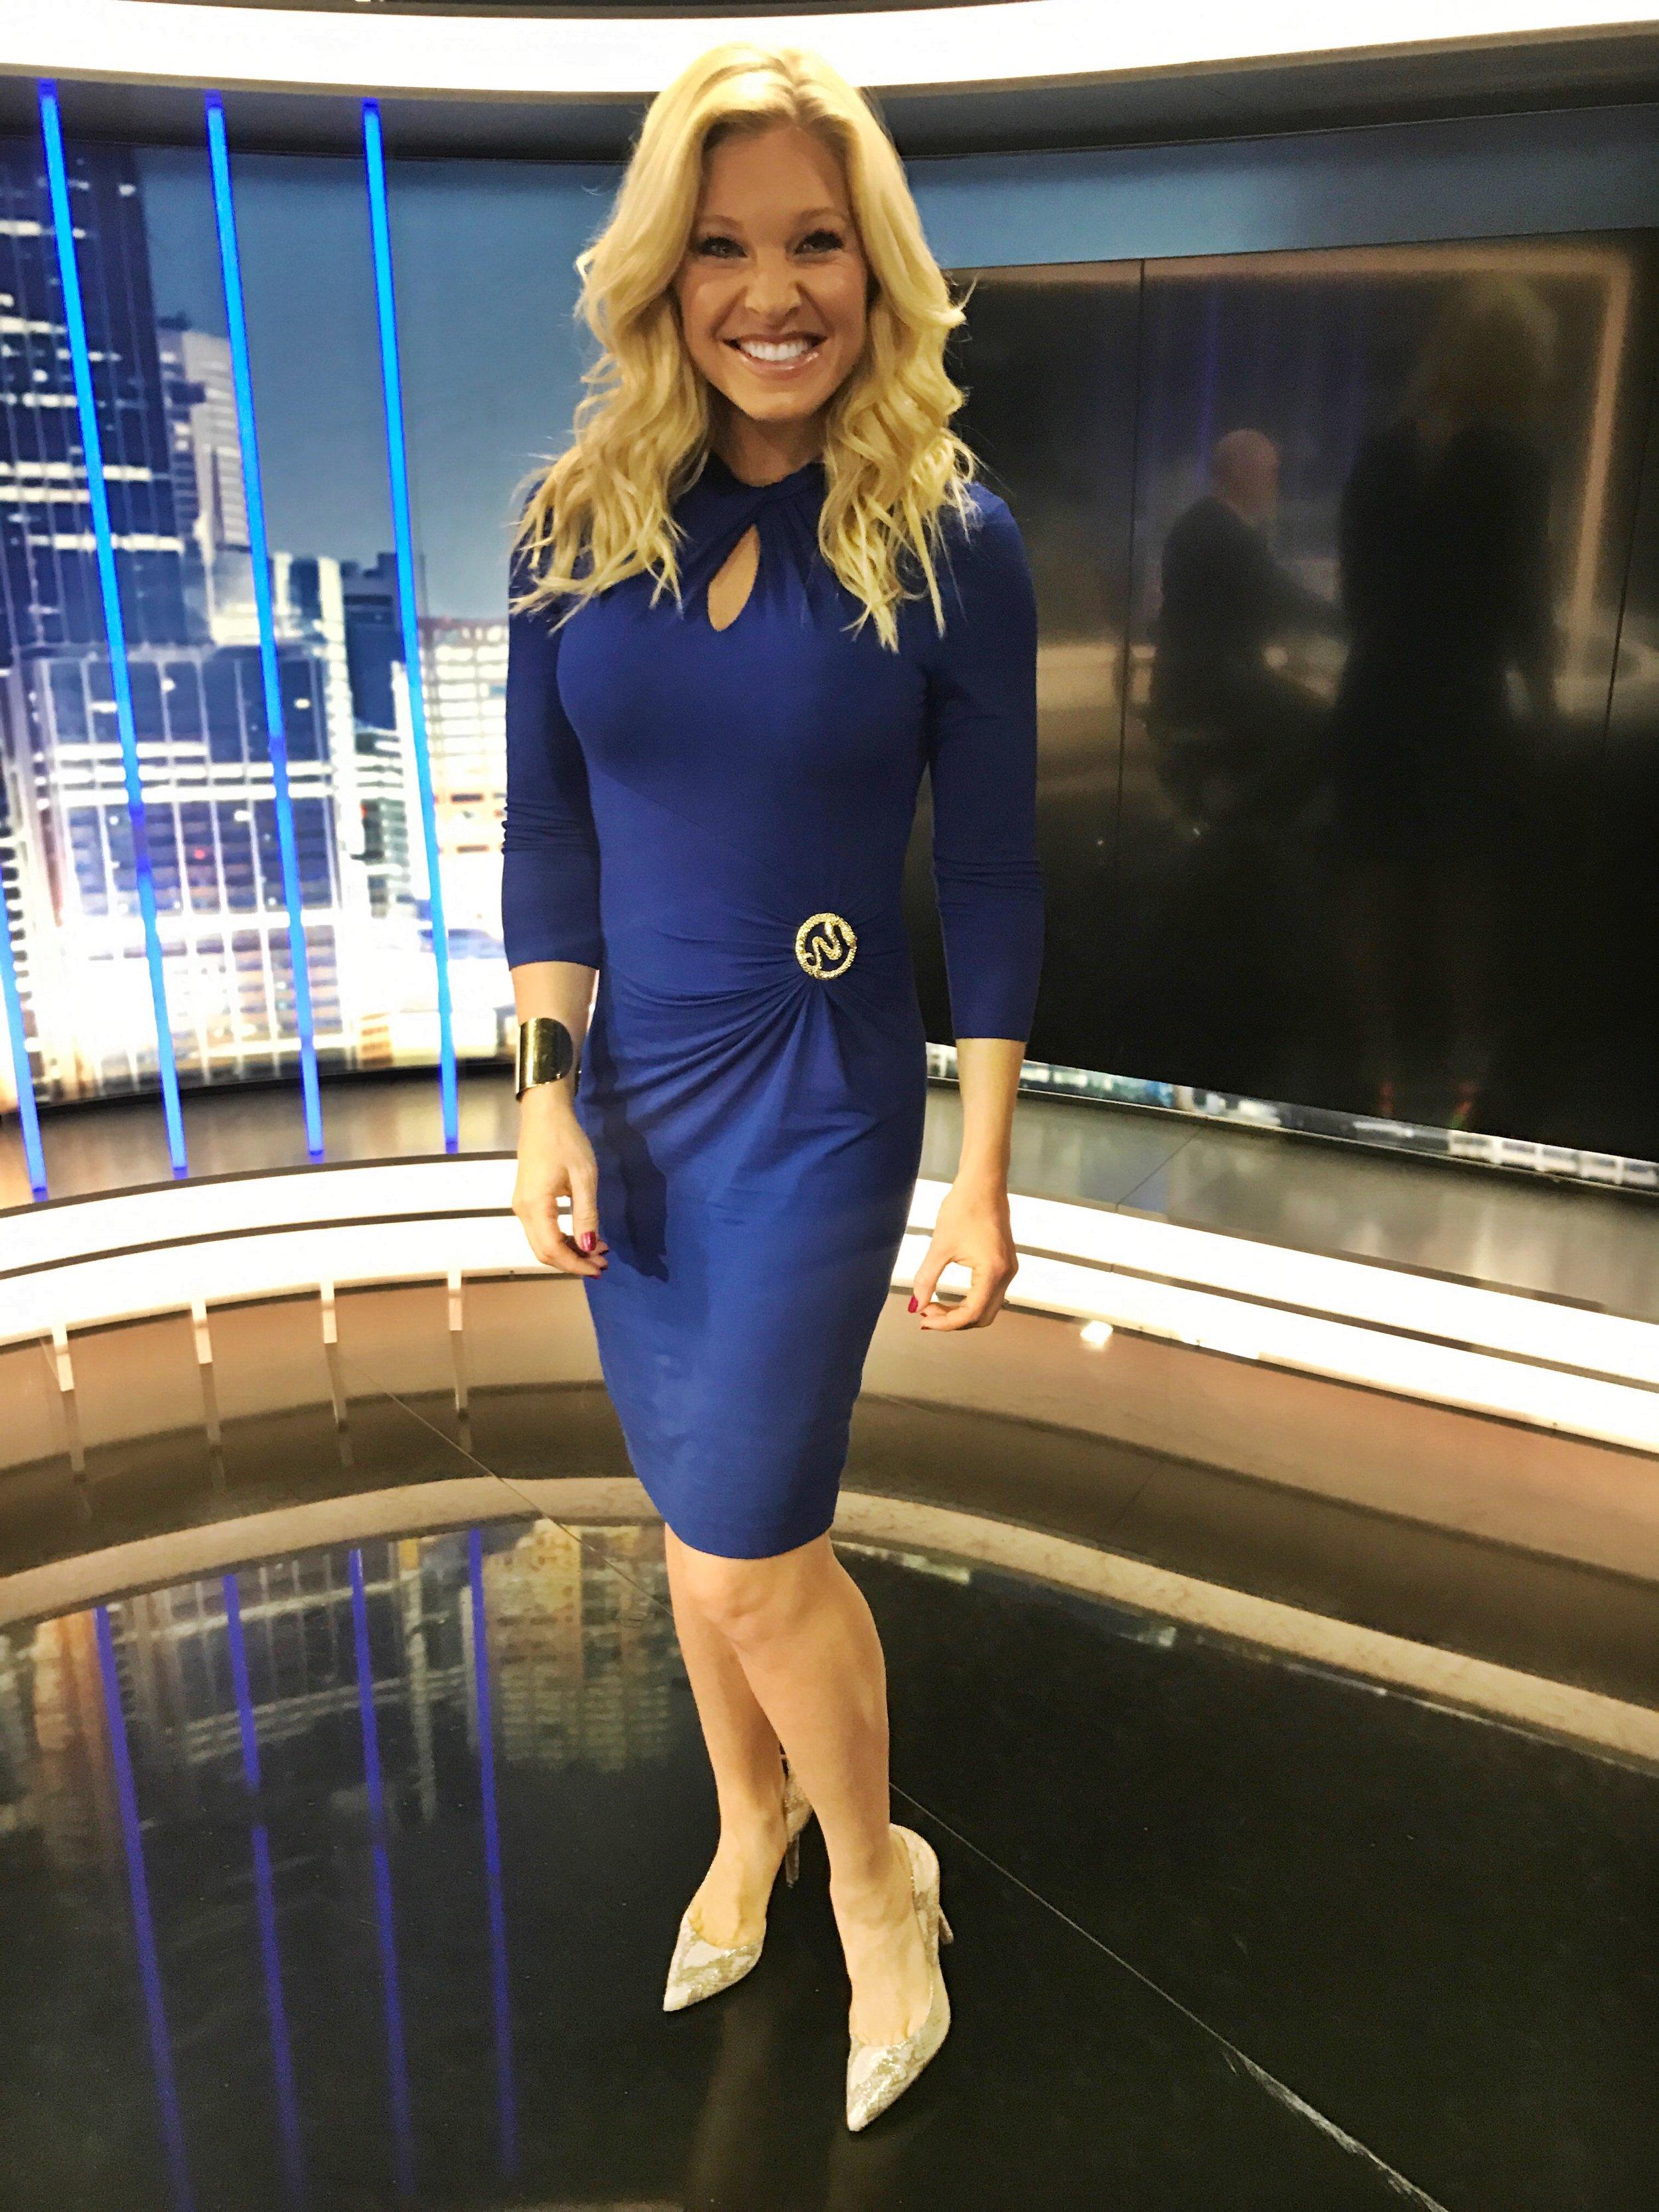 Anna Kooiman Sky News AnnaKooiman.com PML 25 Jan 2017 fitness travel lifestyle television tv news australia sydney